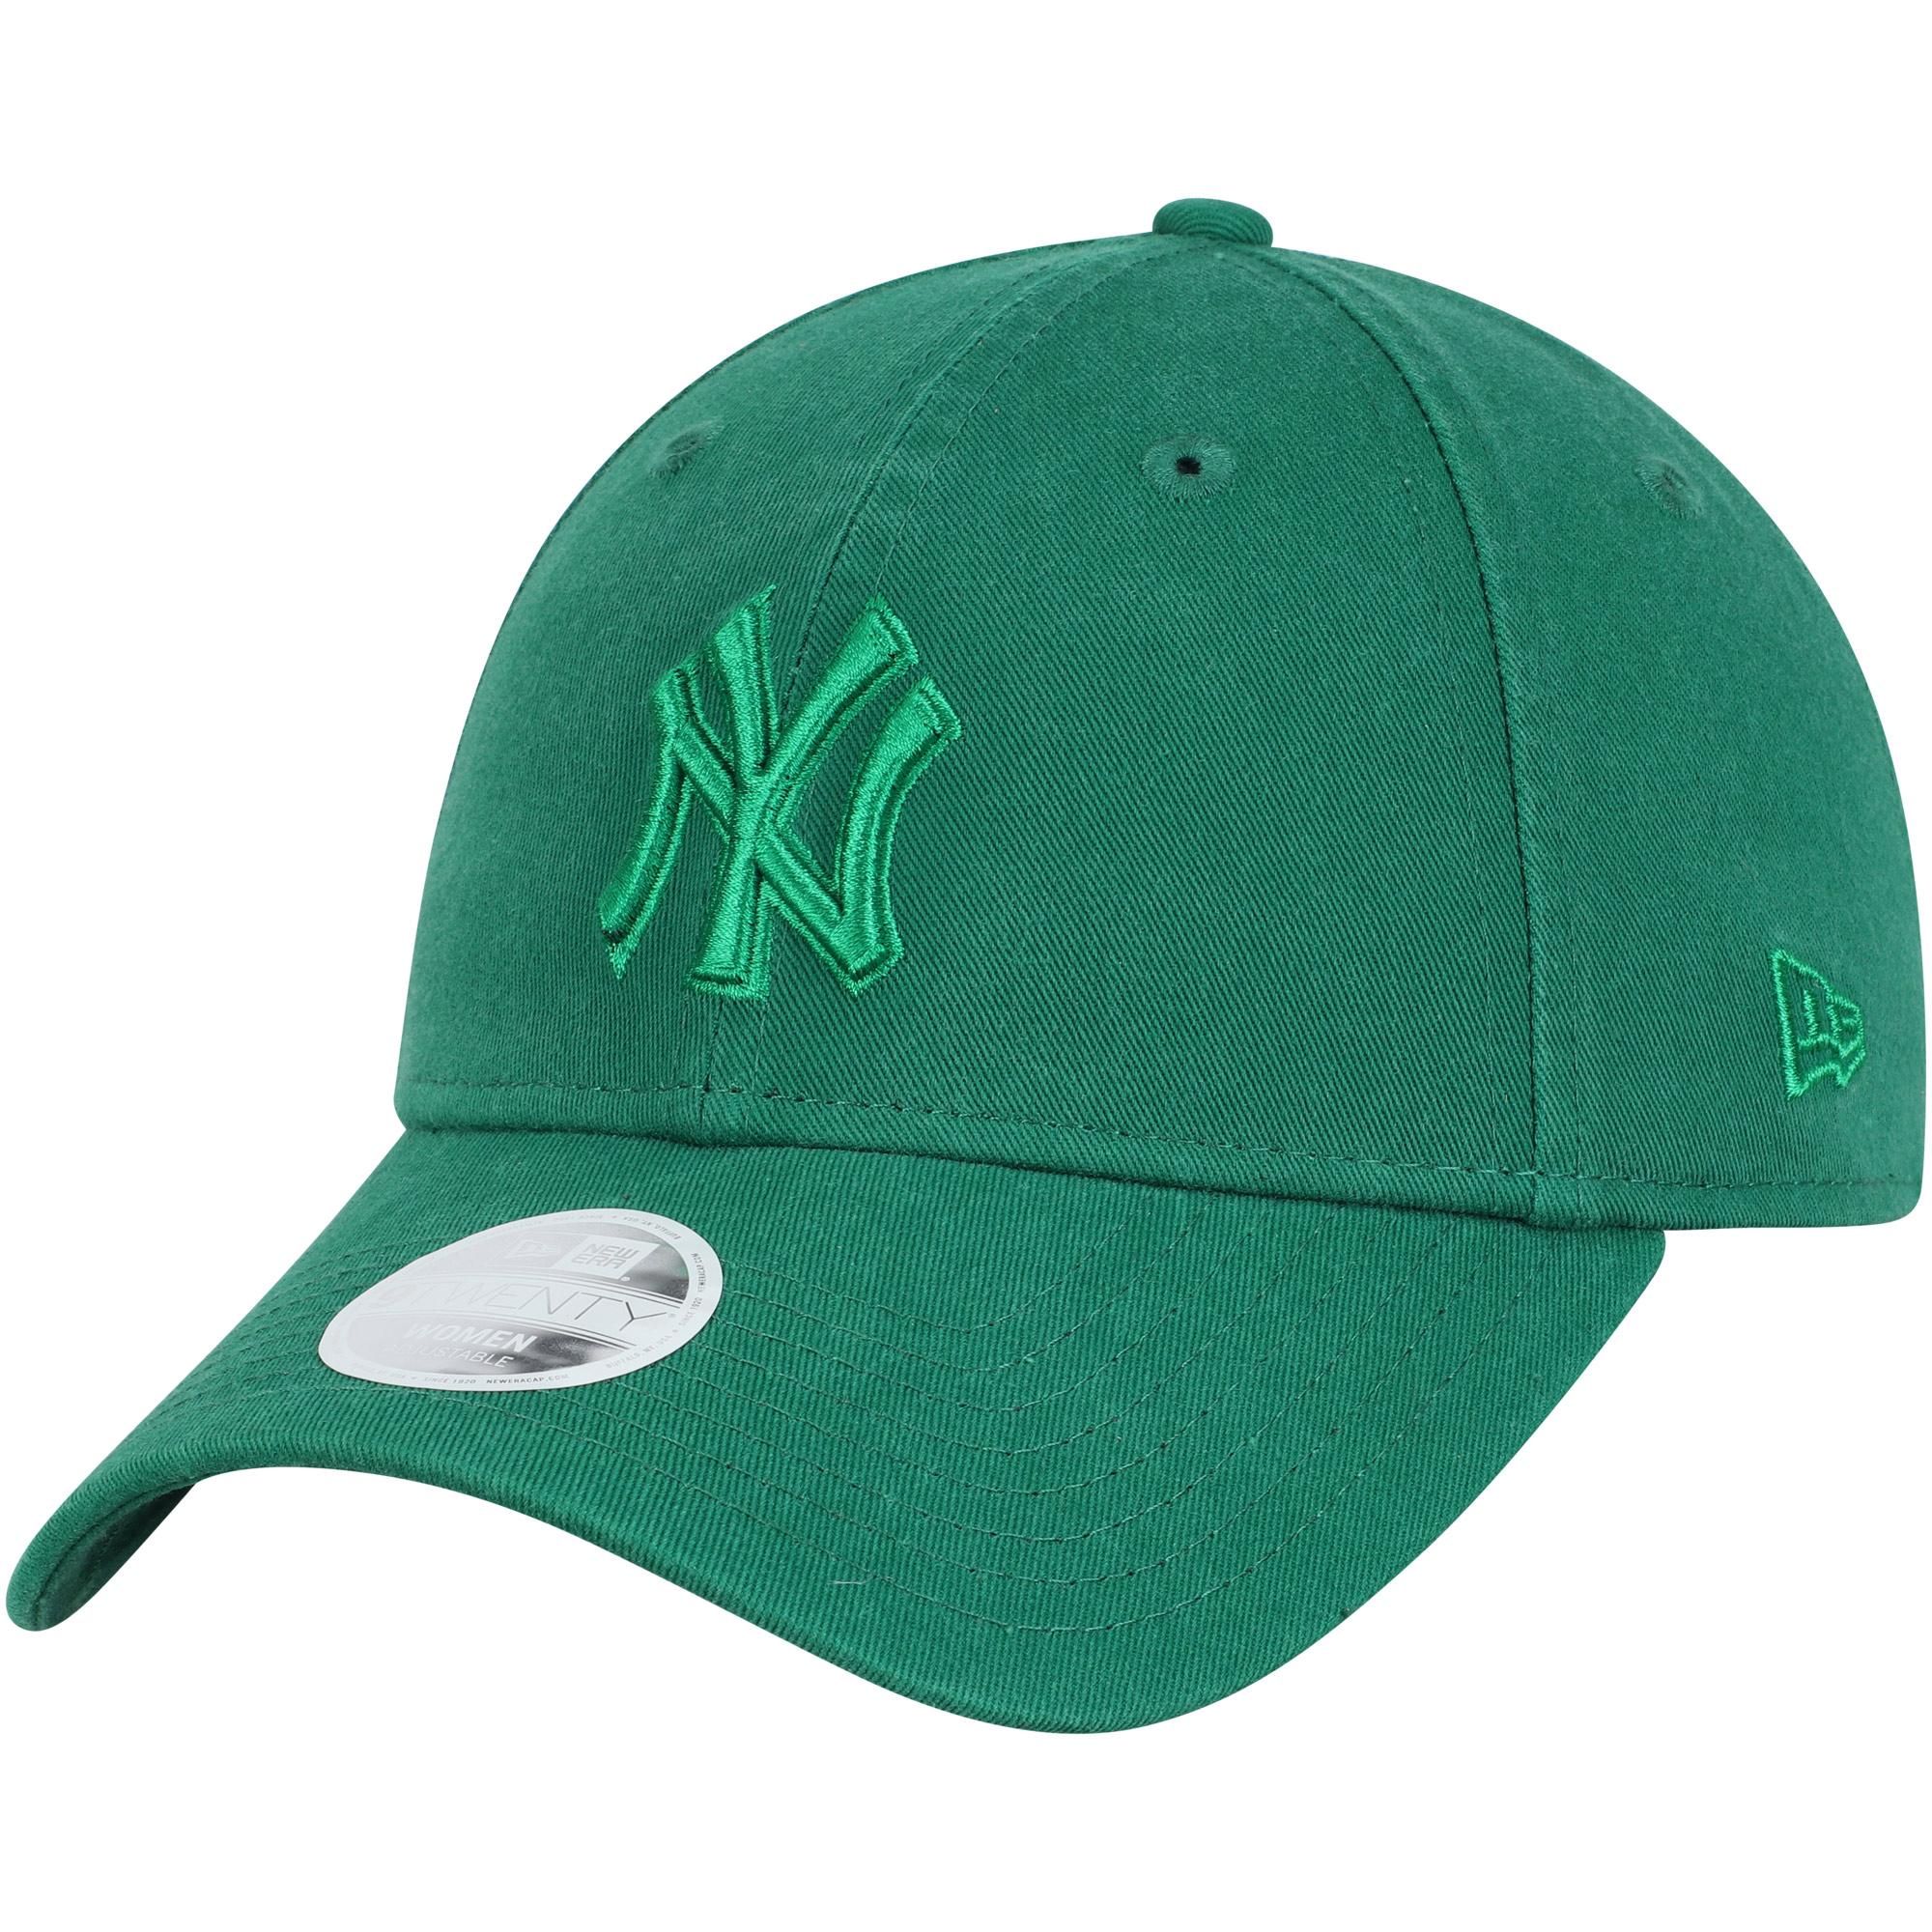 New York Yankees New Era Women's St. Patrick's Day Core Classic 9TWENTY Adjustable Hat - Green - OSFA